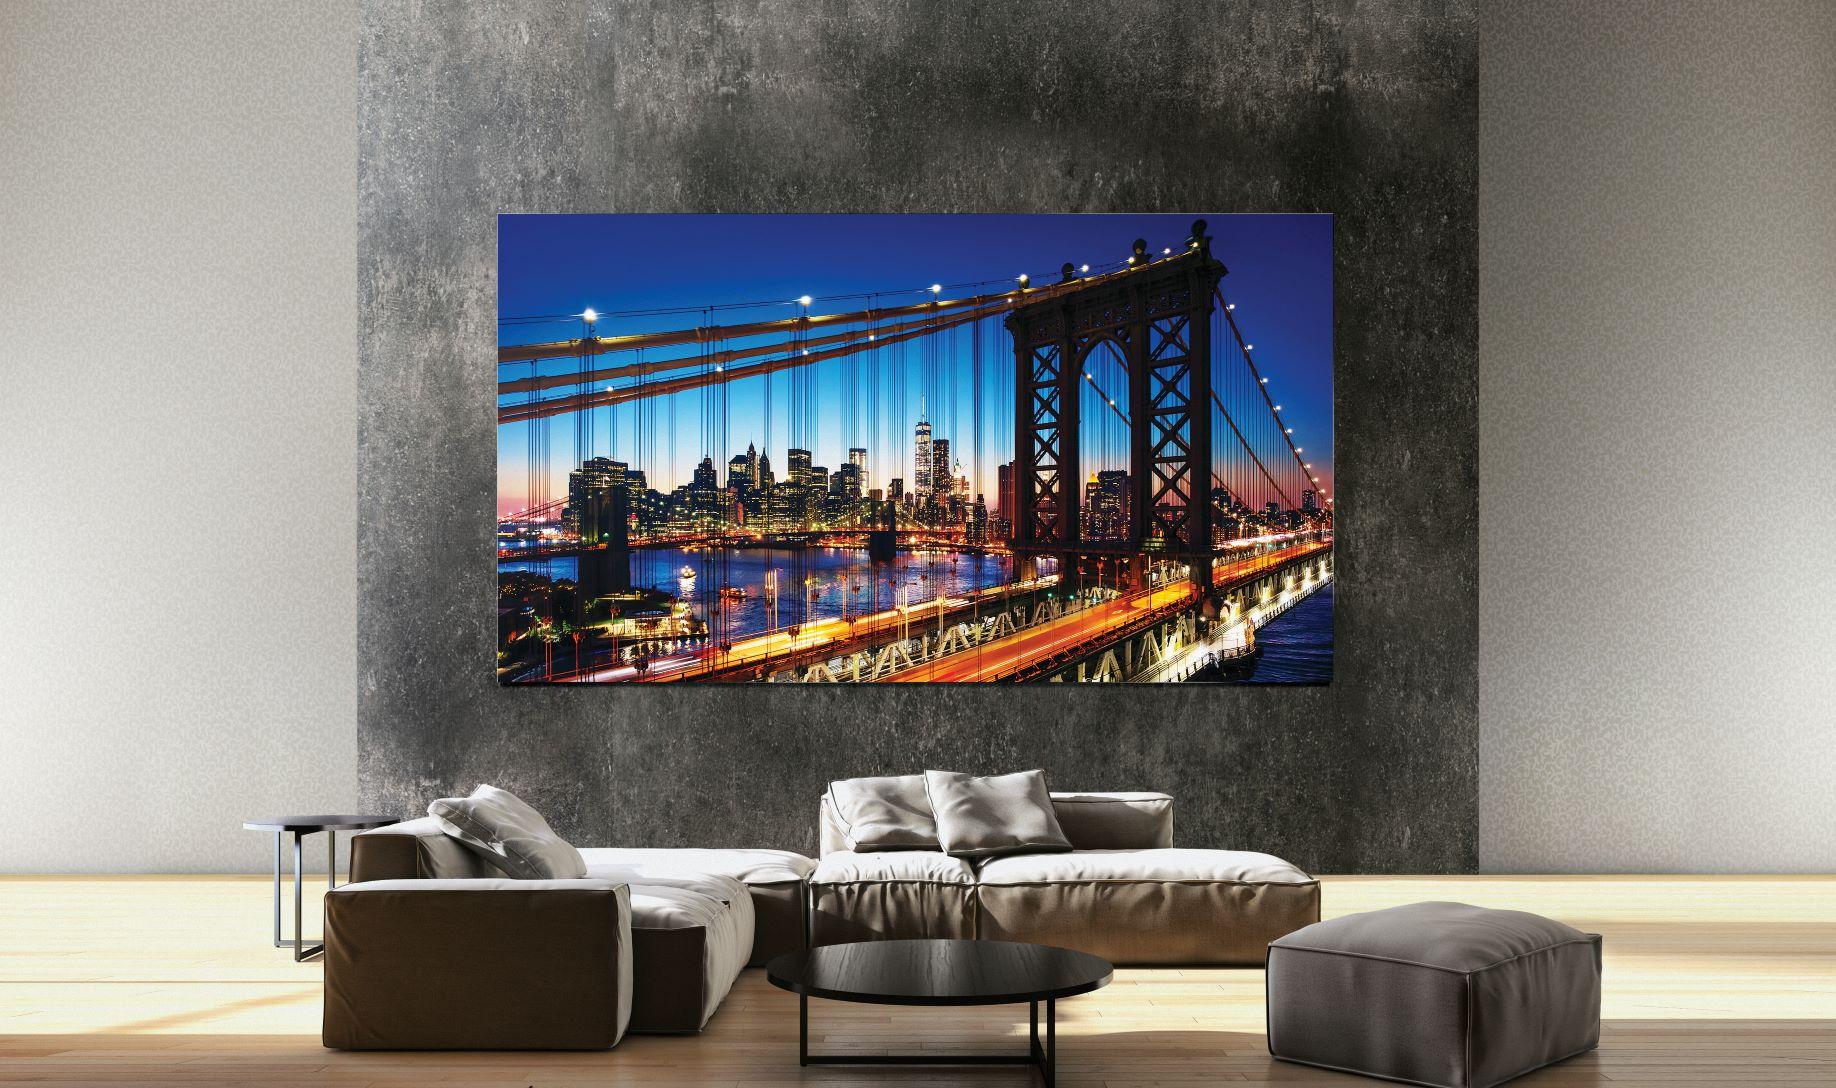 Samsung представляет новейшую линейку телевизоров MicroLED, QLED 8K и Lifestyle серию